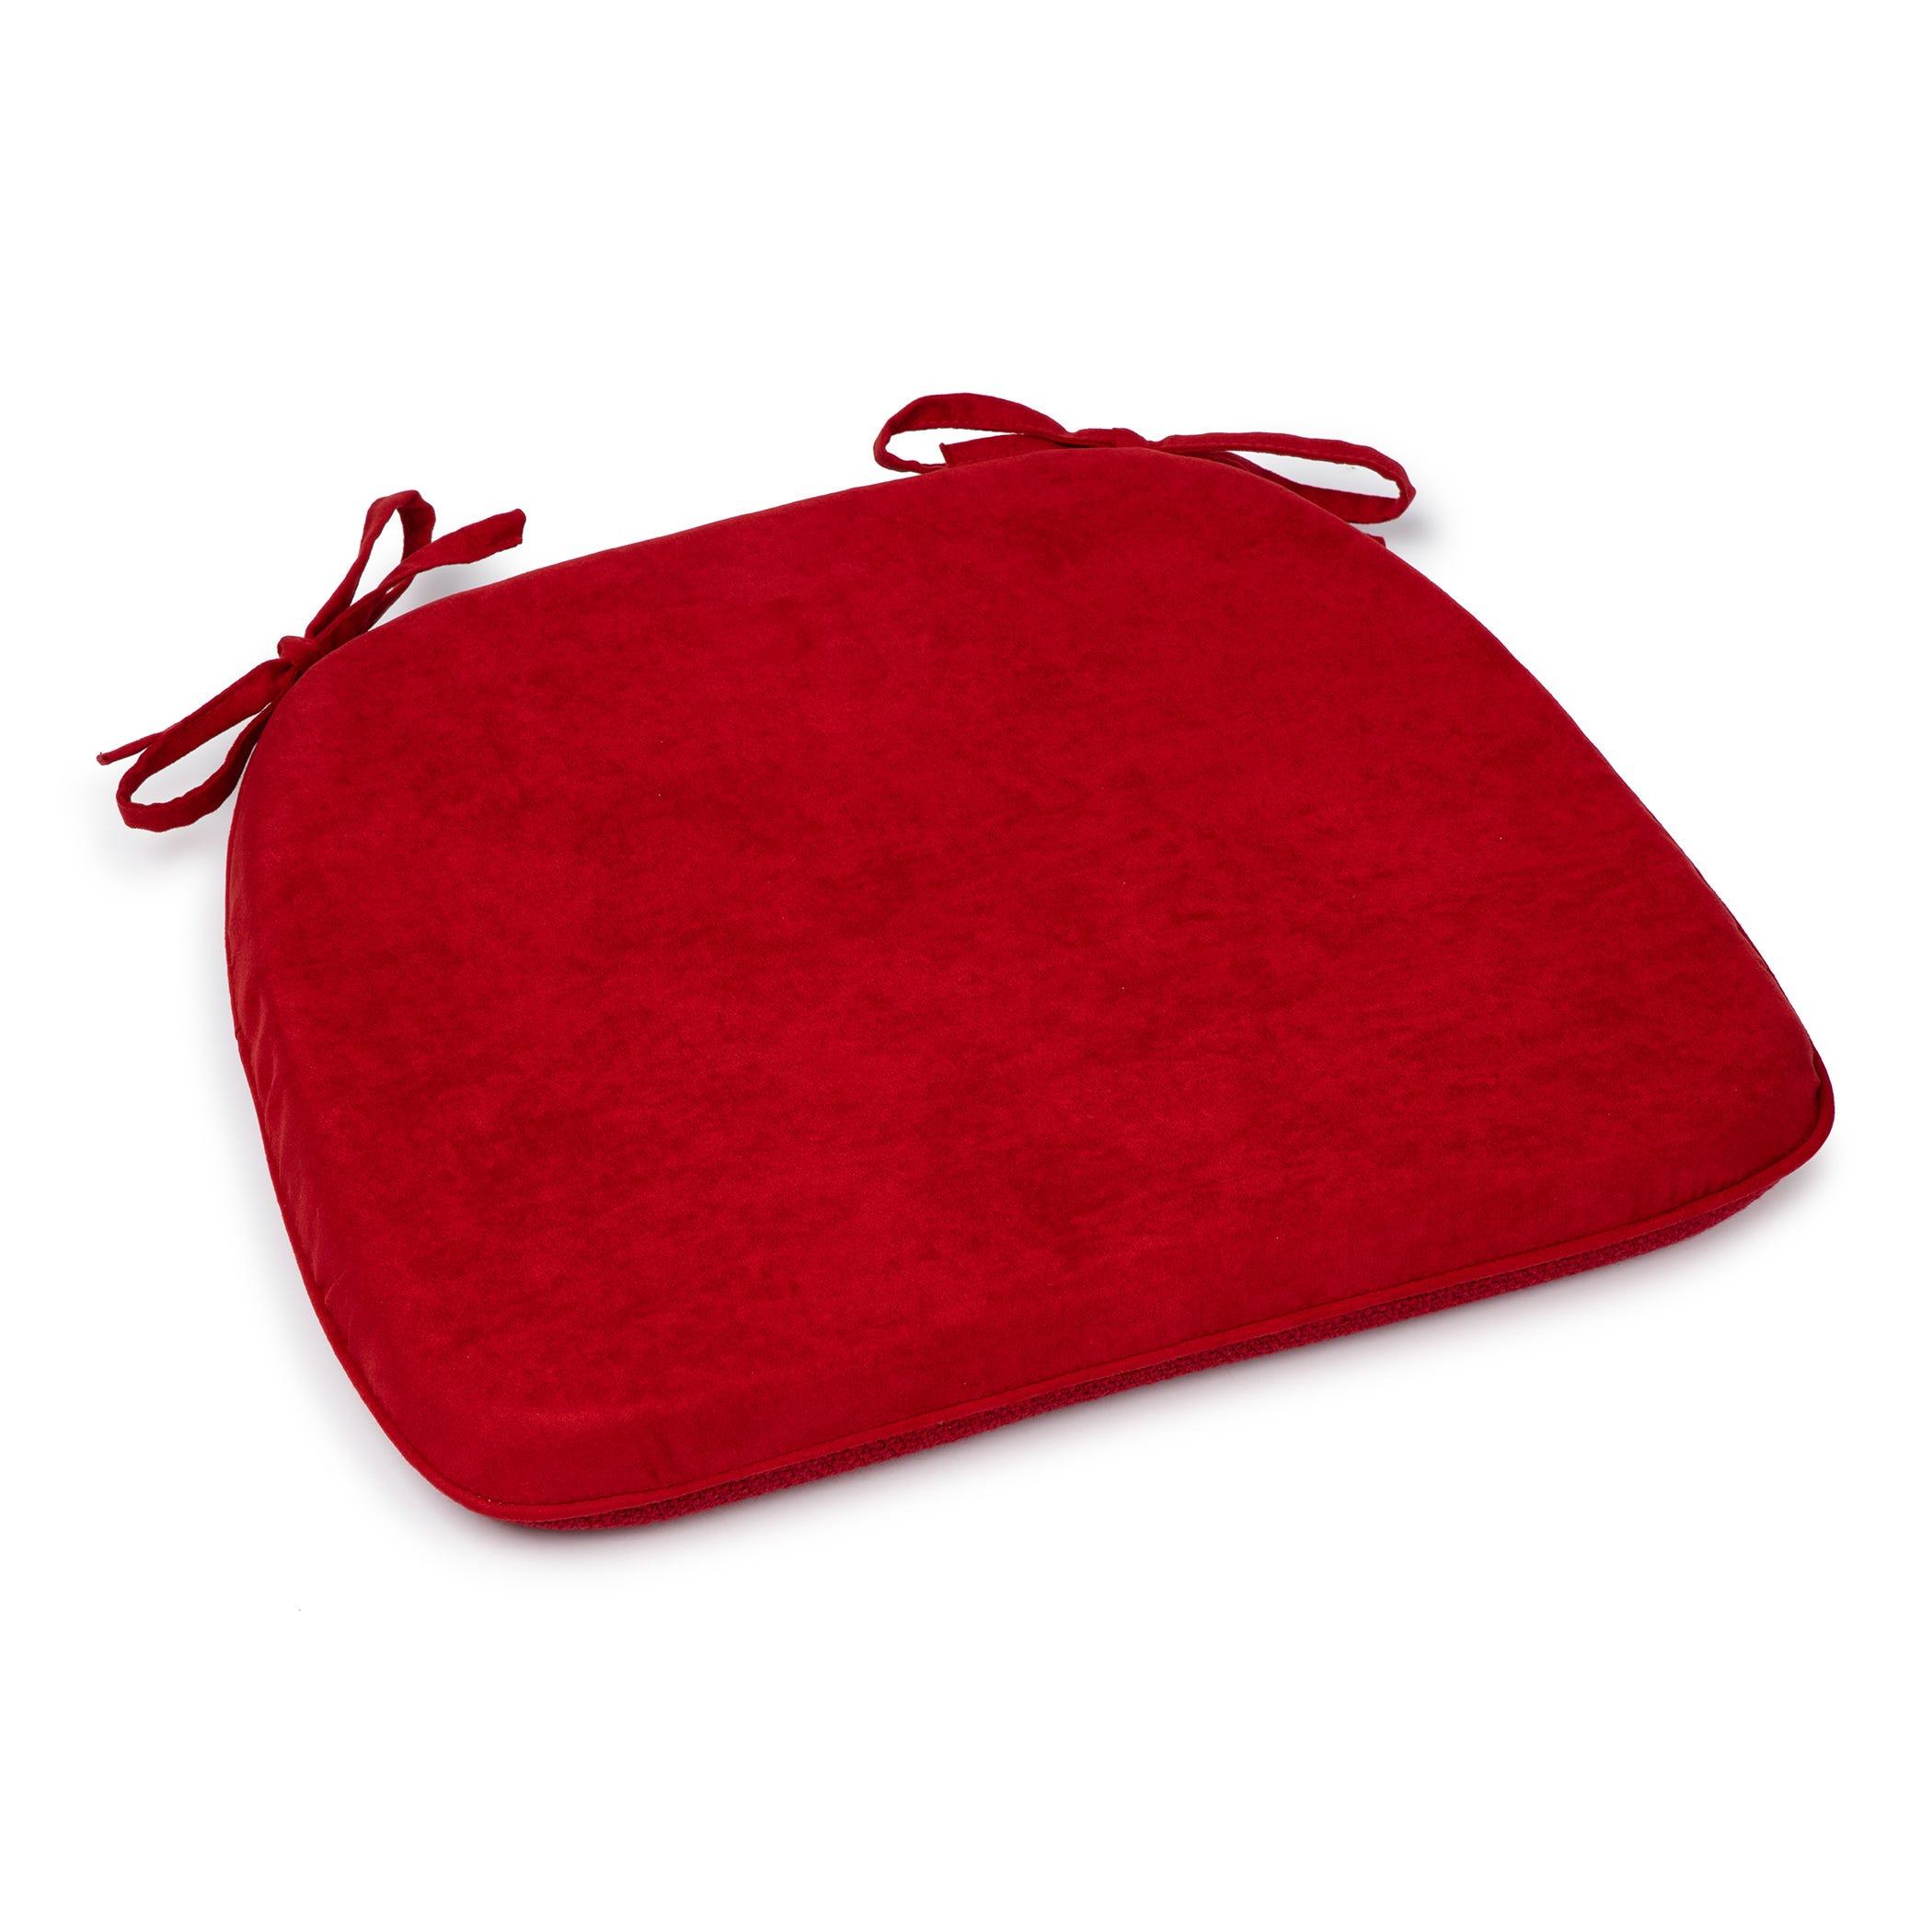 Cojín de poliéster para silla Simply Essential™ color rojo